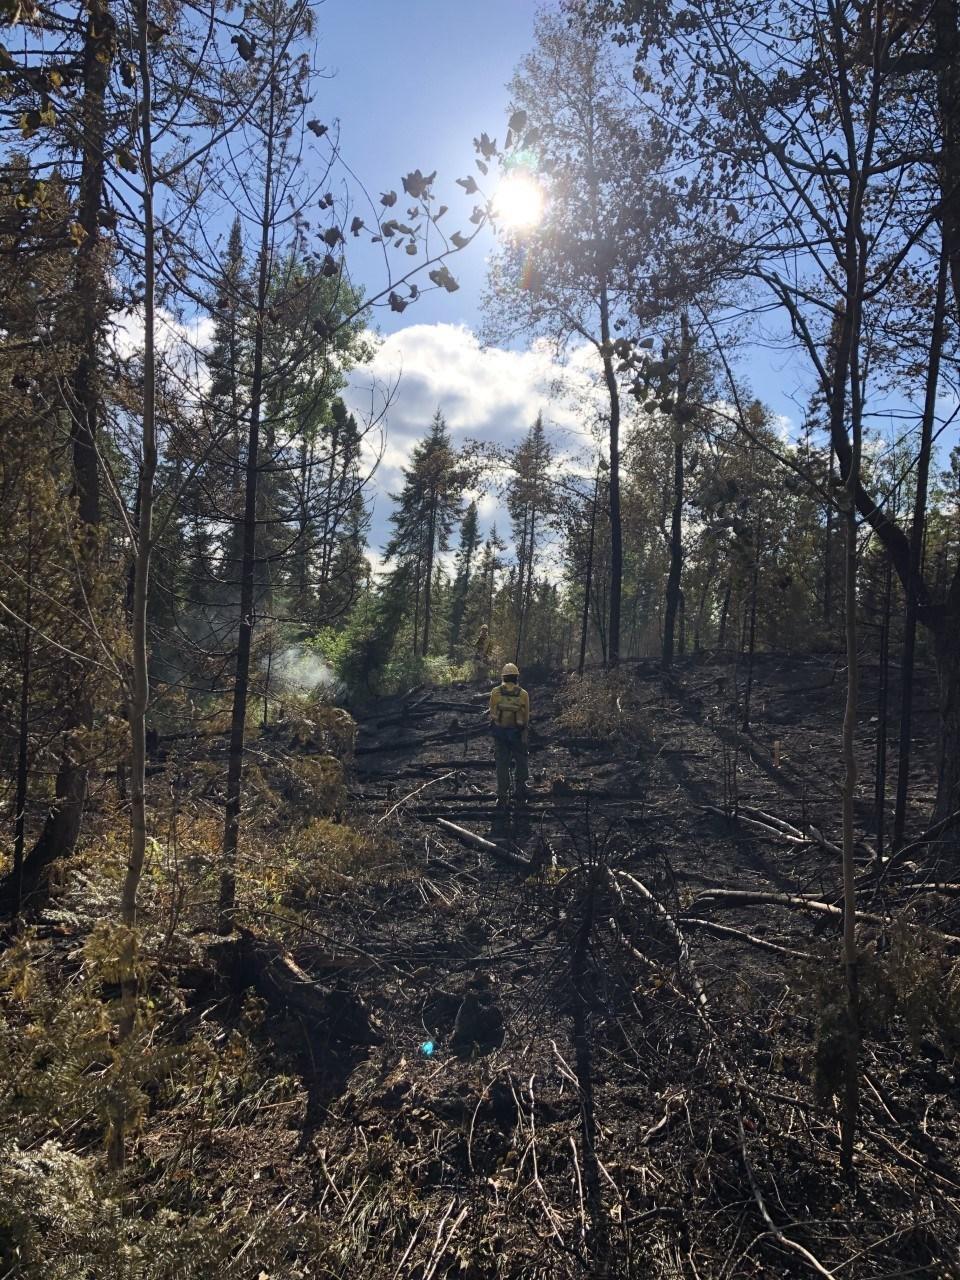 member standing in burned forest